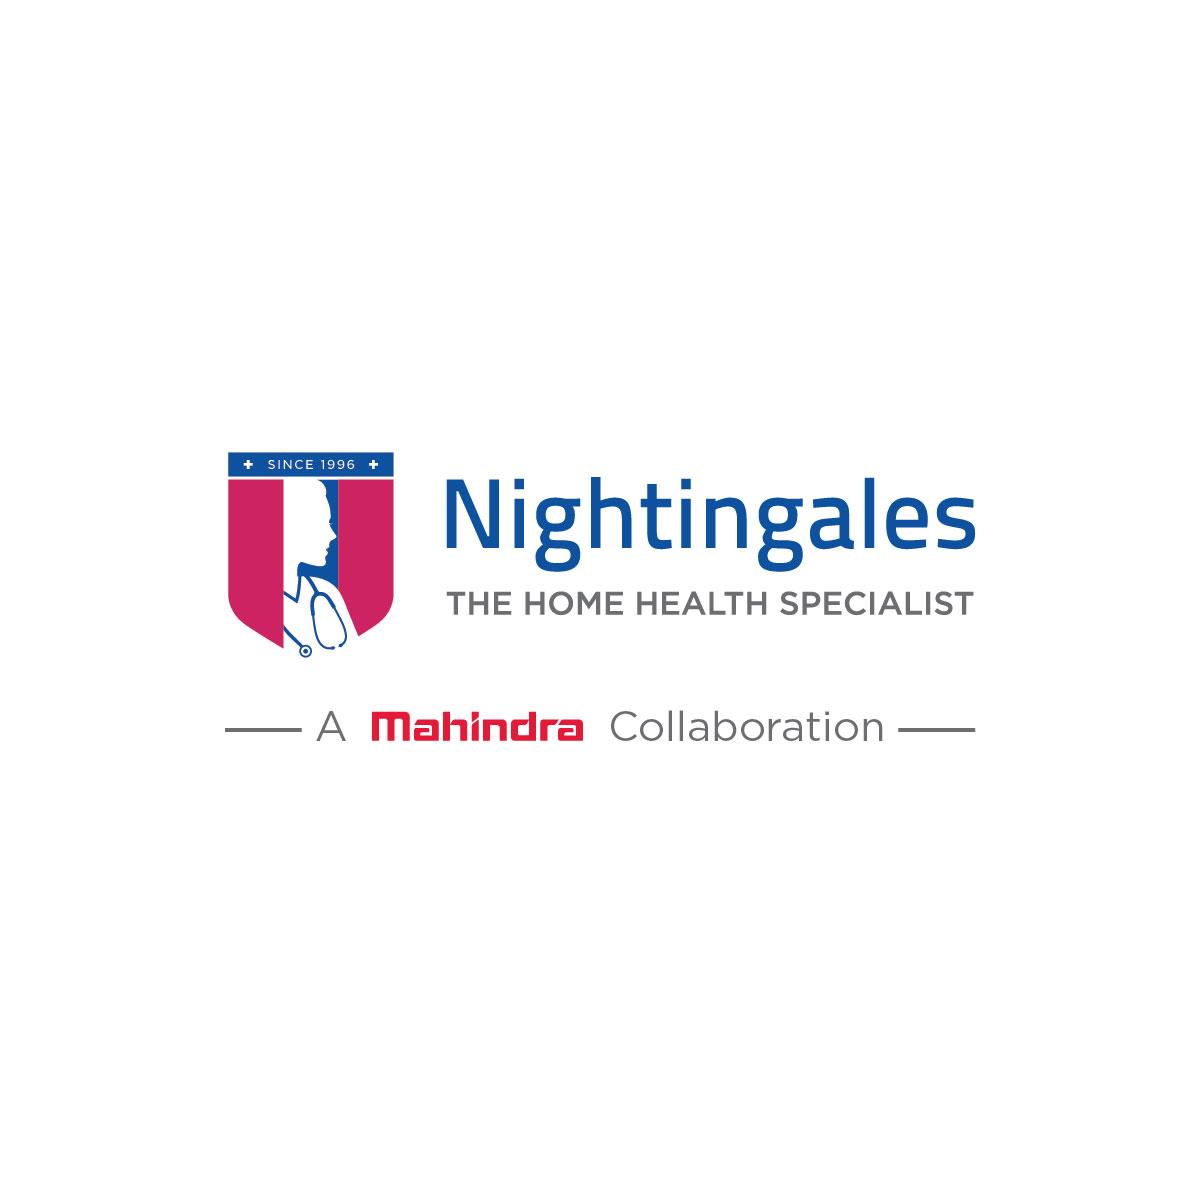 https://www.mncjobsindia.com/company/nightingales-home-health-services-a-mahindra-col